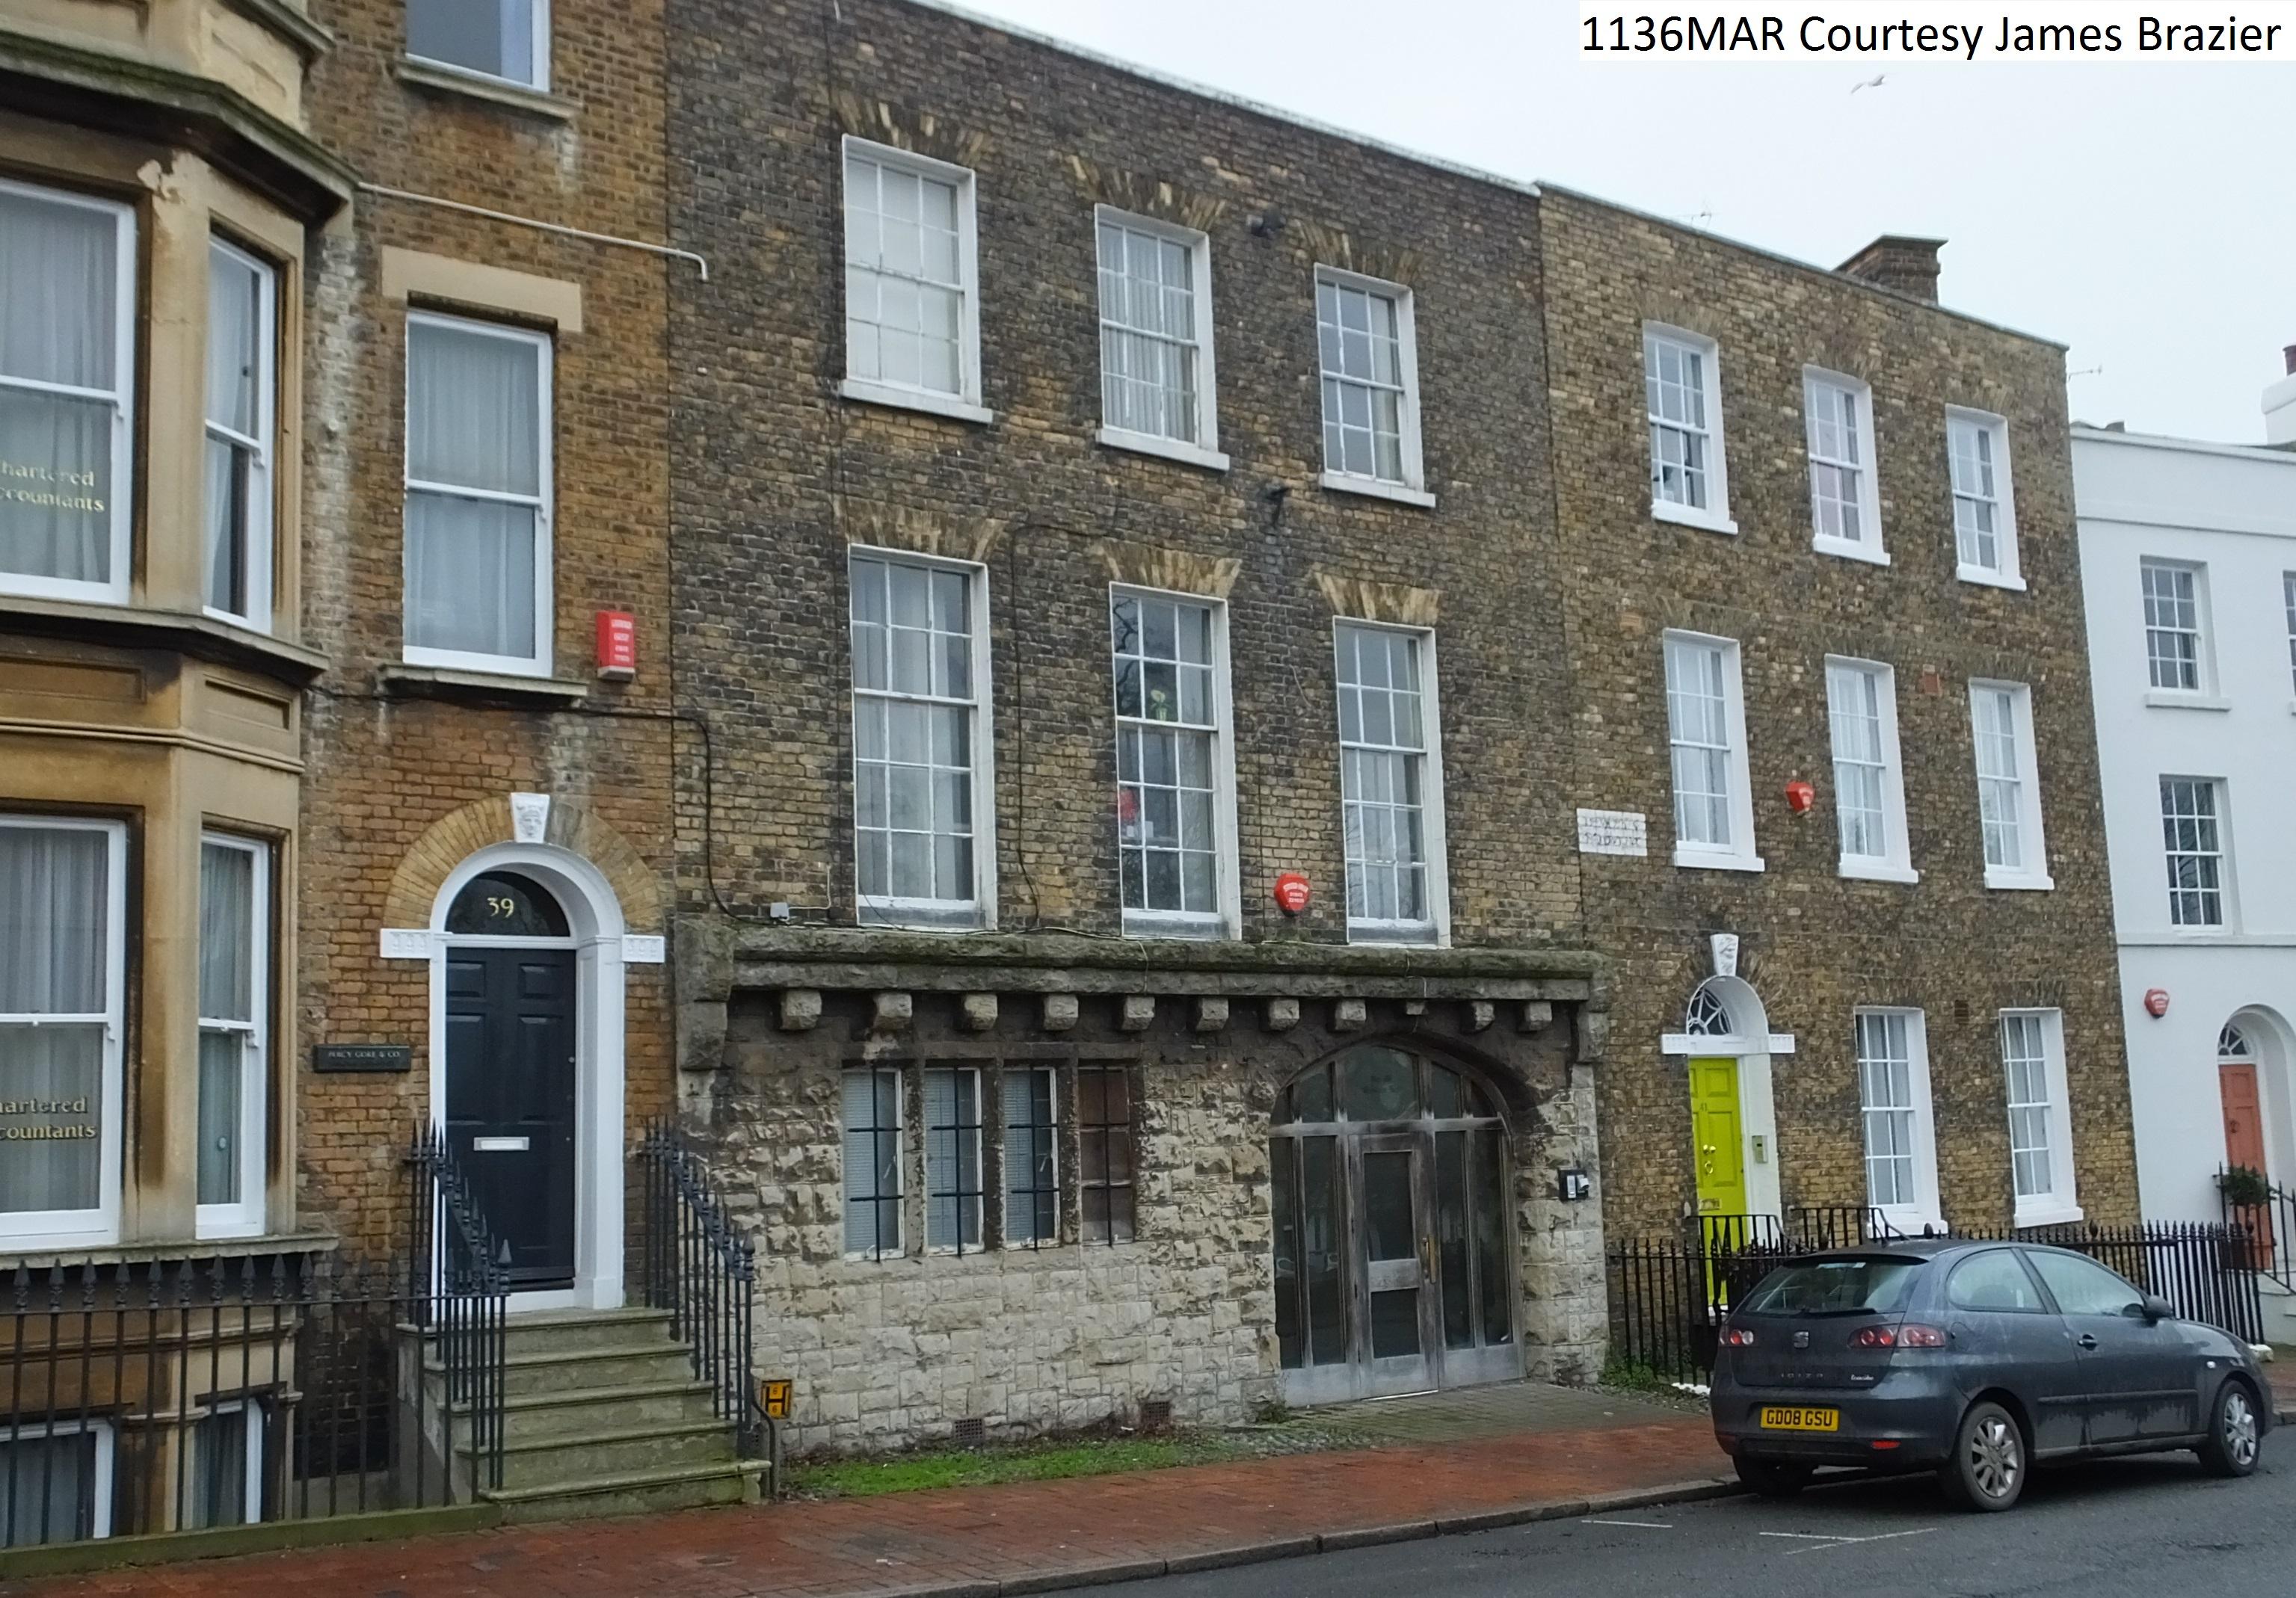 Former-Drill-Hall-40-Hawley-Square-Margate